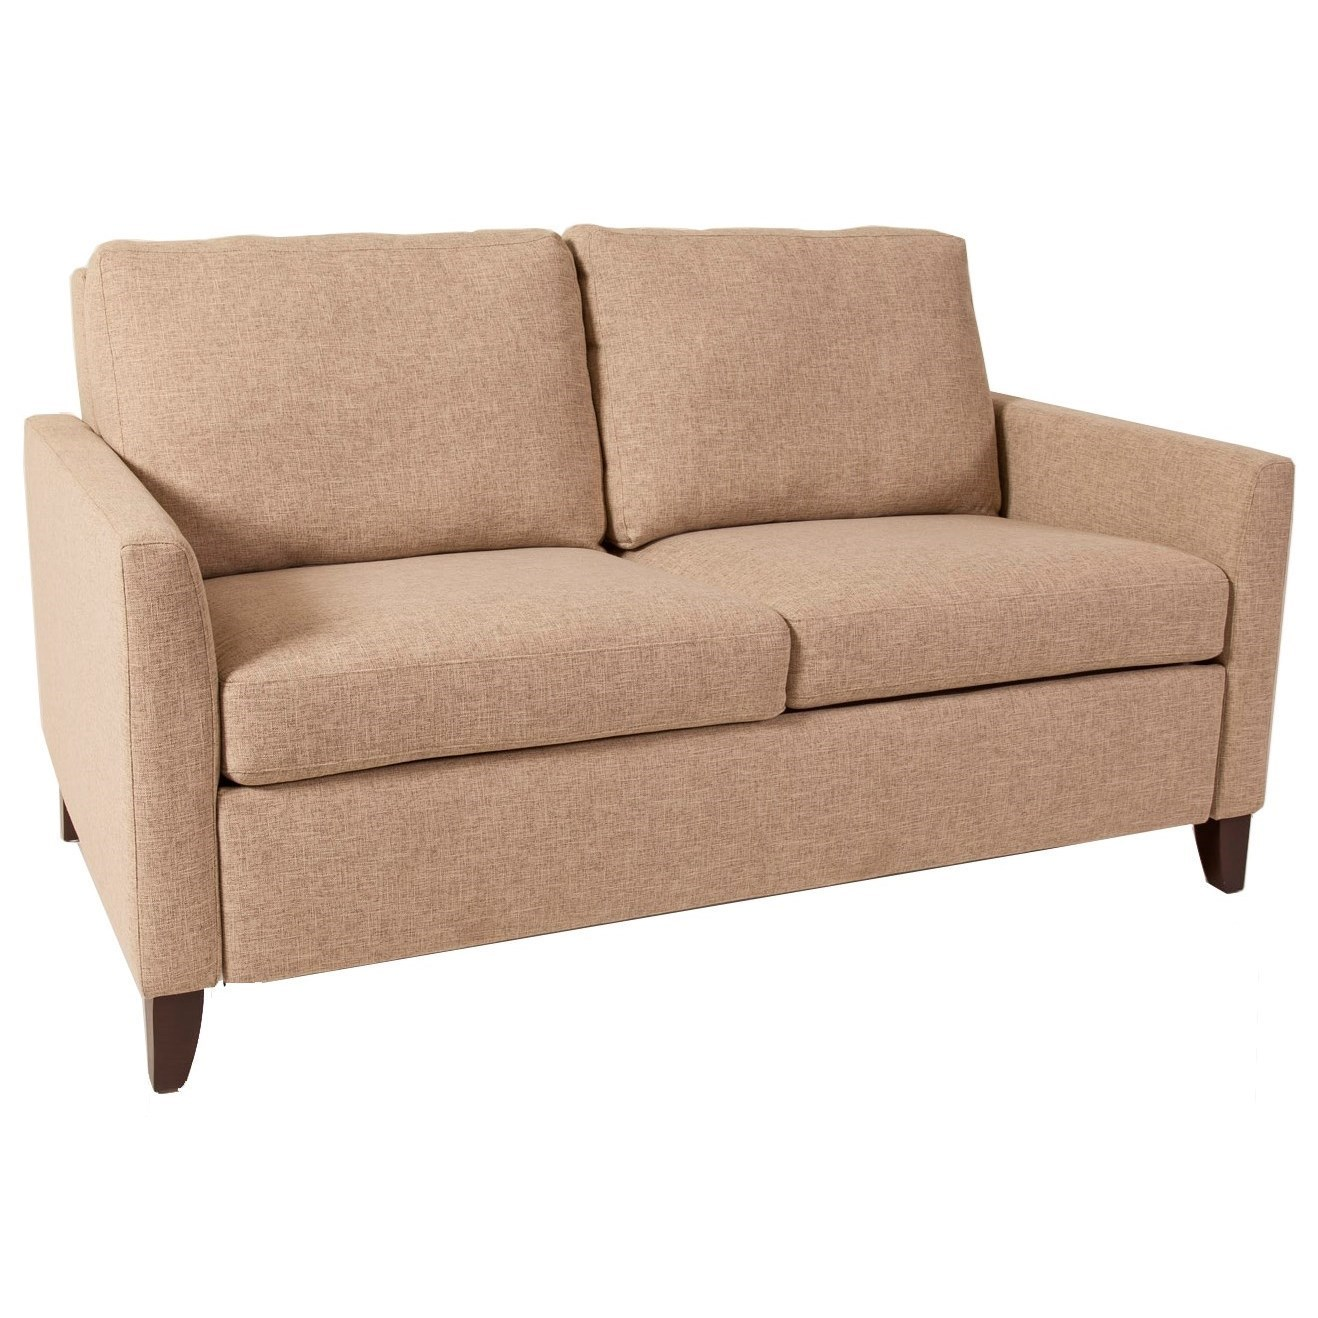 American Leather Comfort Sleeper   Hannah Contemporary Full Sofa Sleeper    Baeru0027s Furniture   Sleeper Sofas